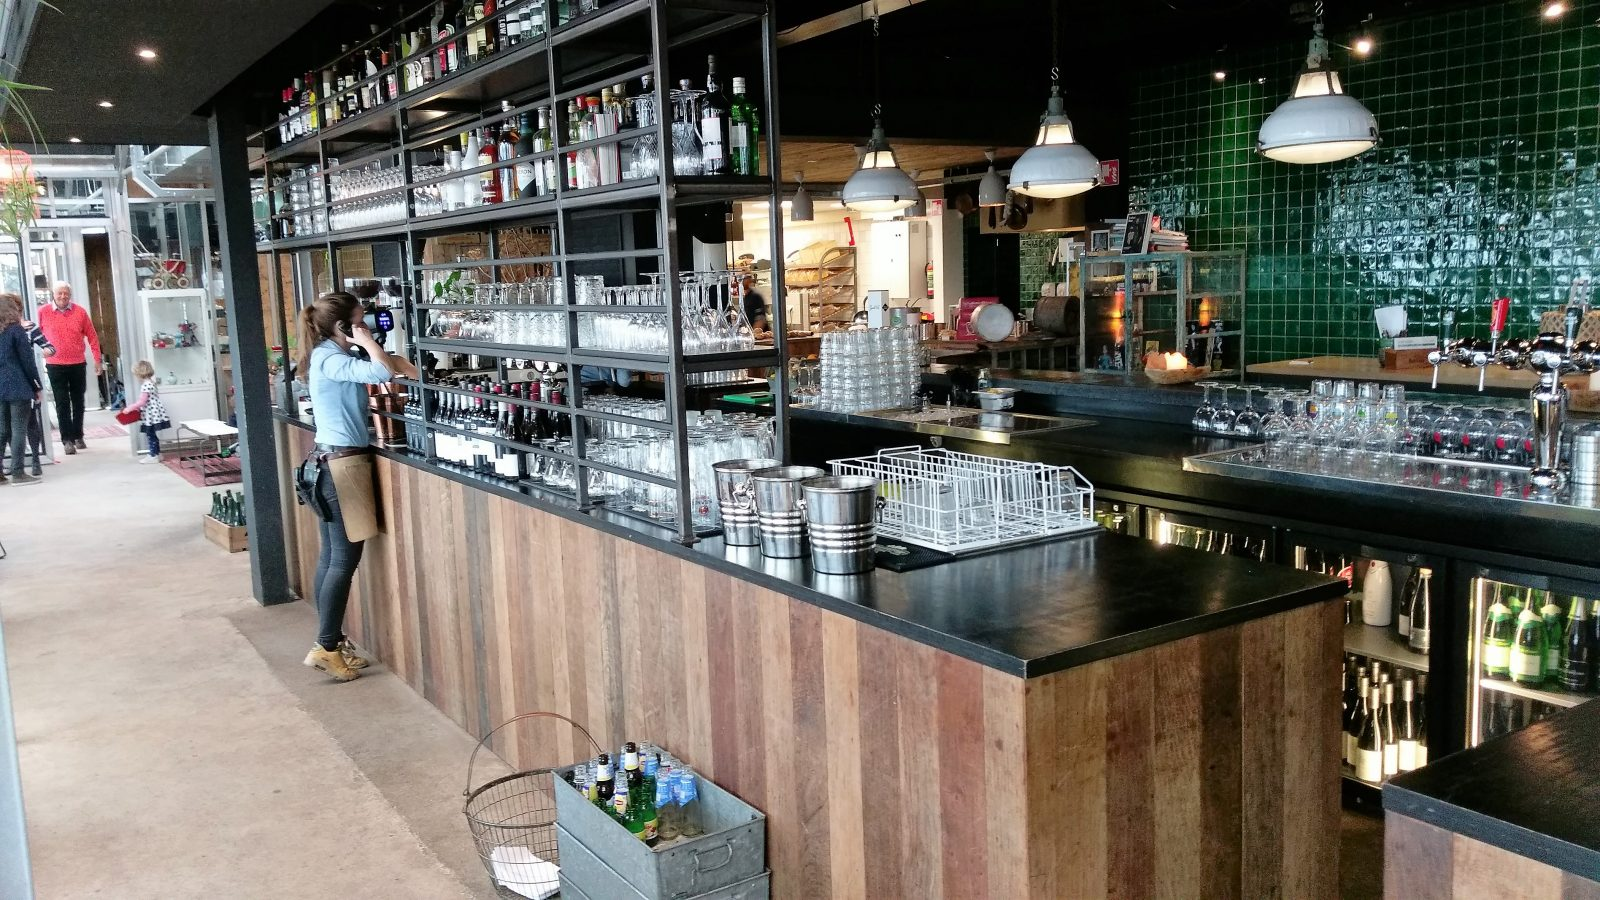 Brasserie Buitenhuis bar